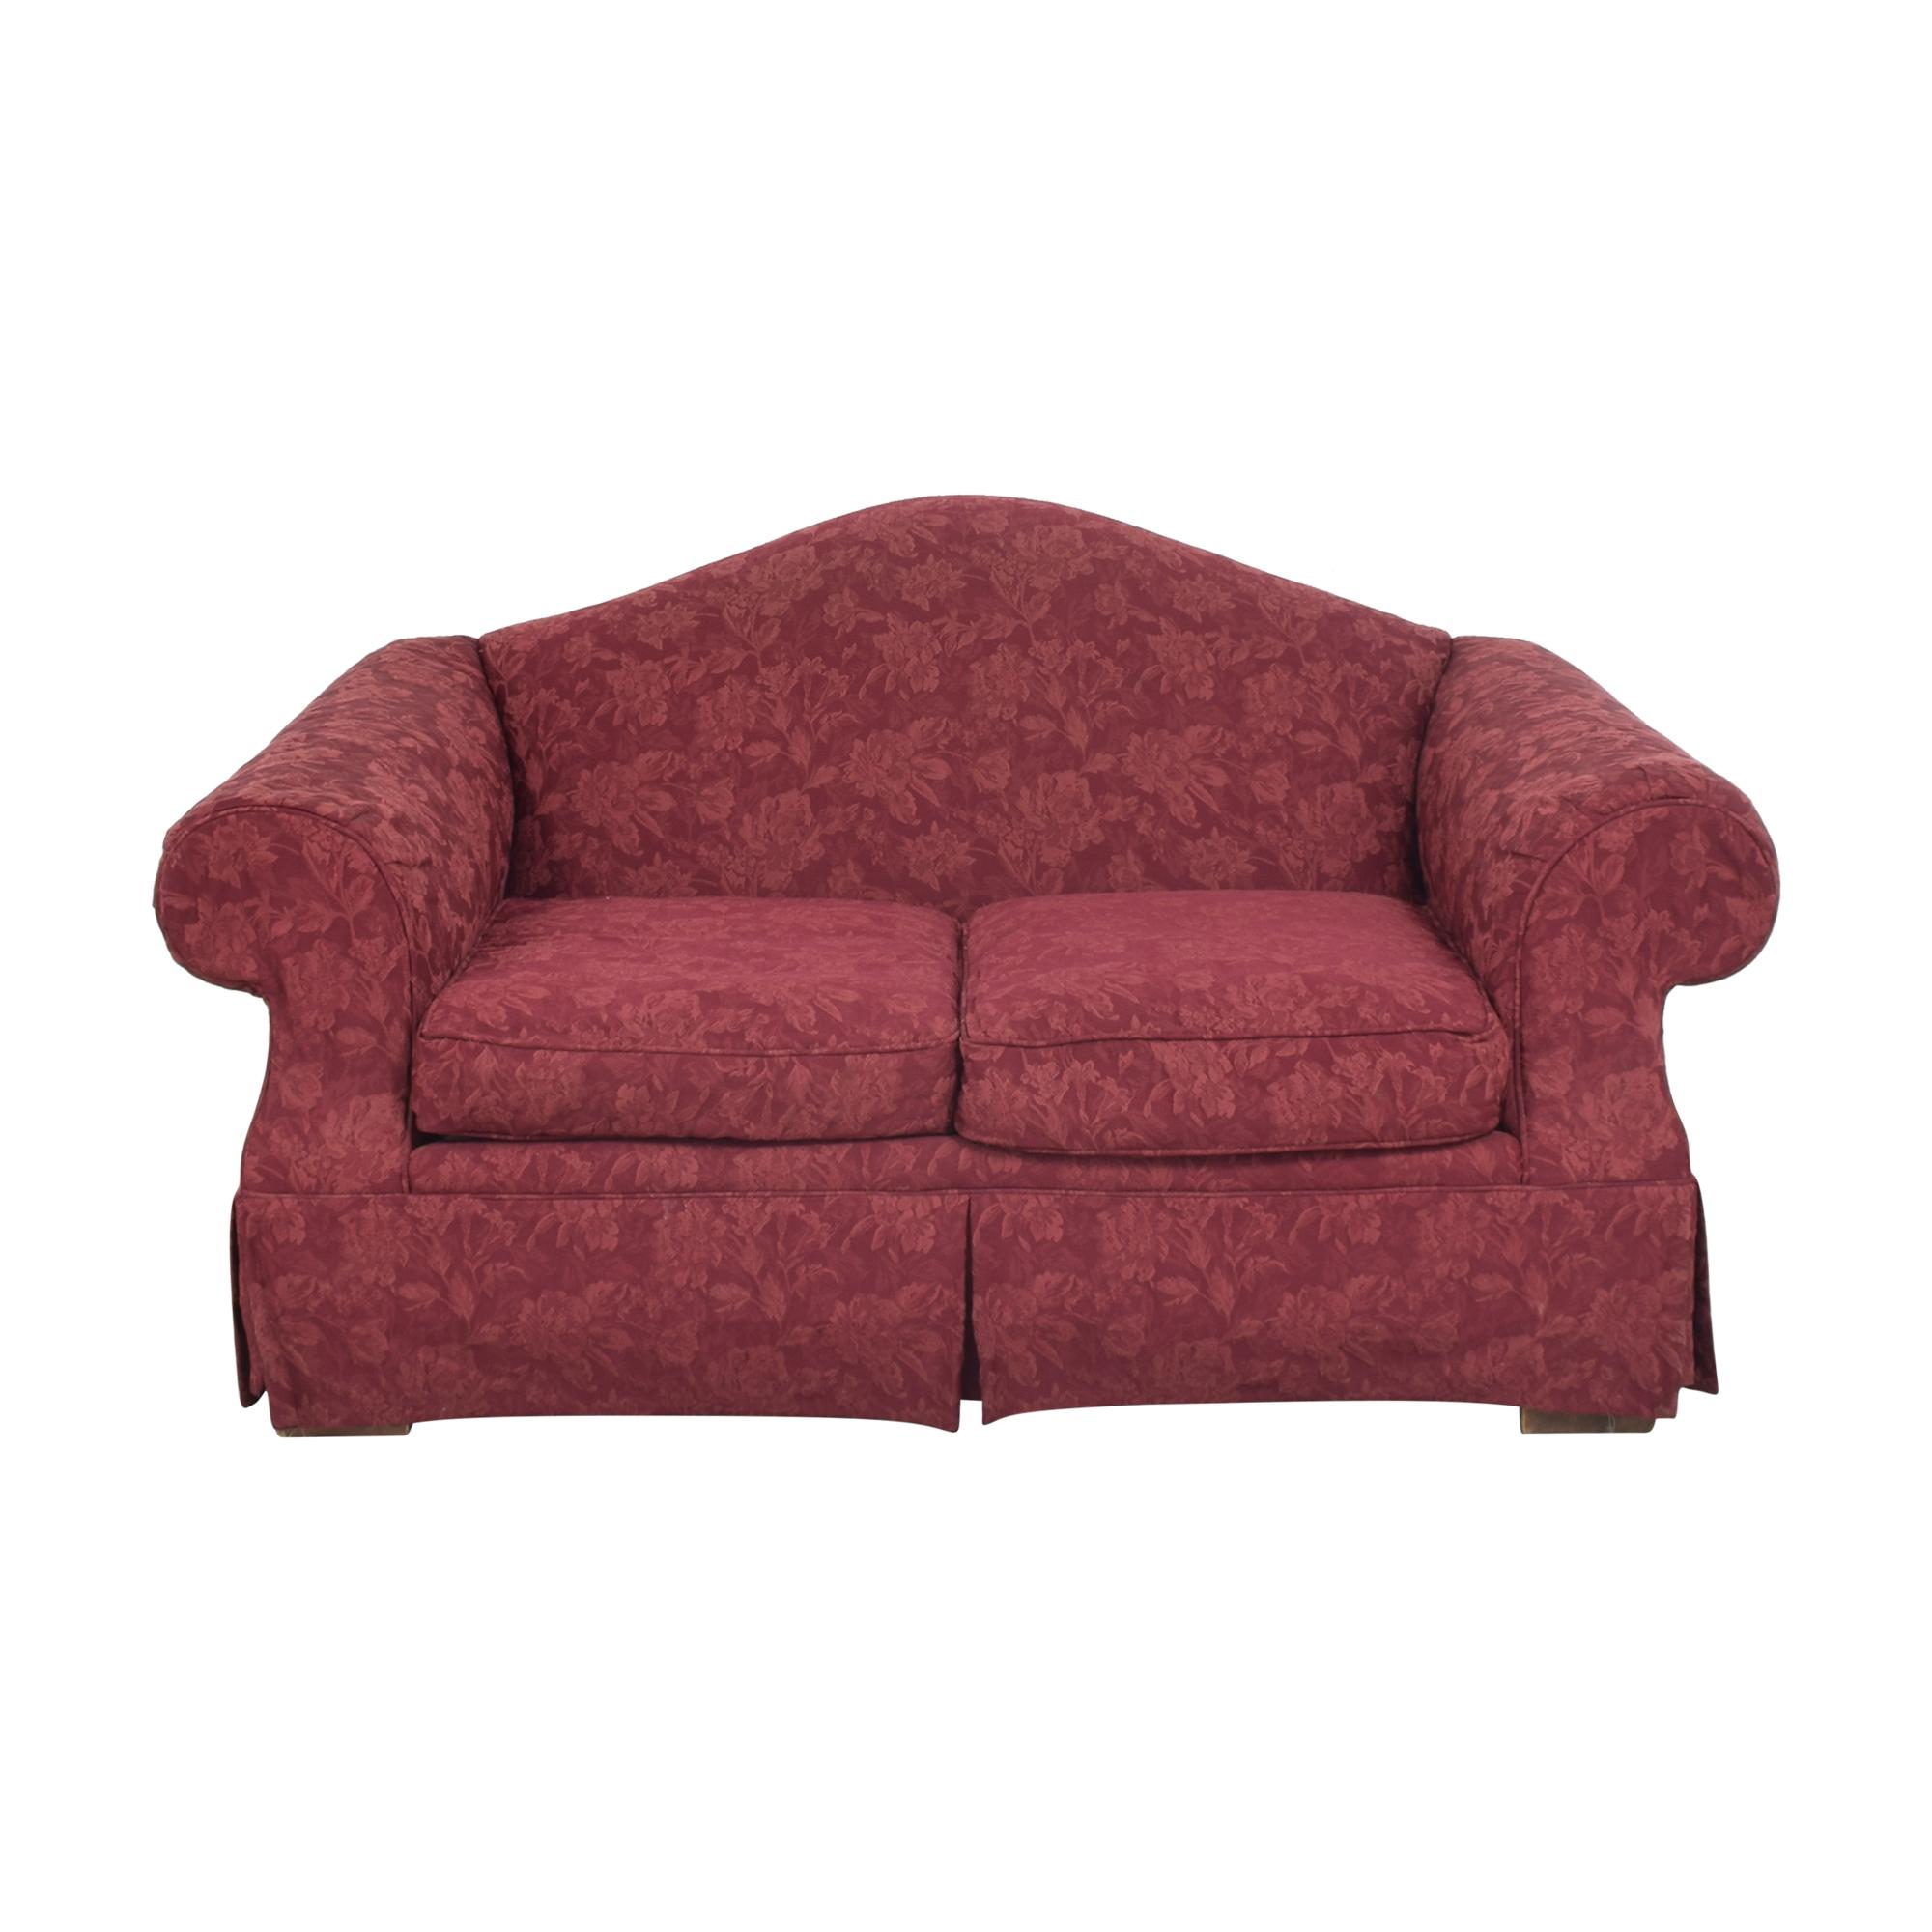 shop Craftmaster Camelback Skirted Sofa Craftmaster Furniture Classic Sofas